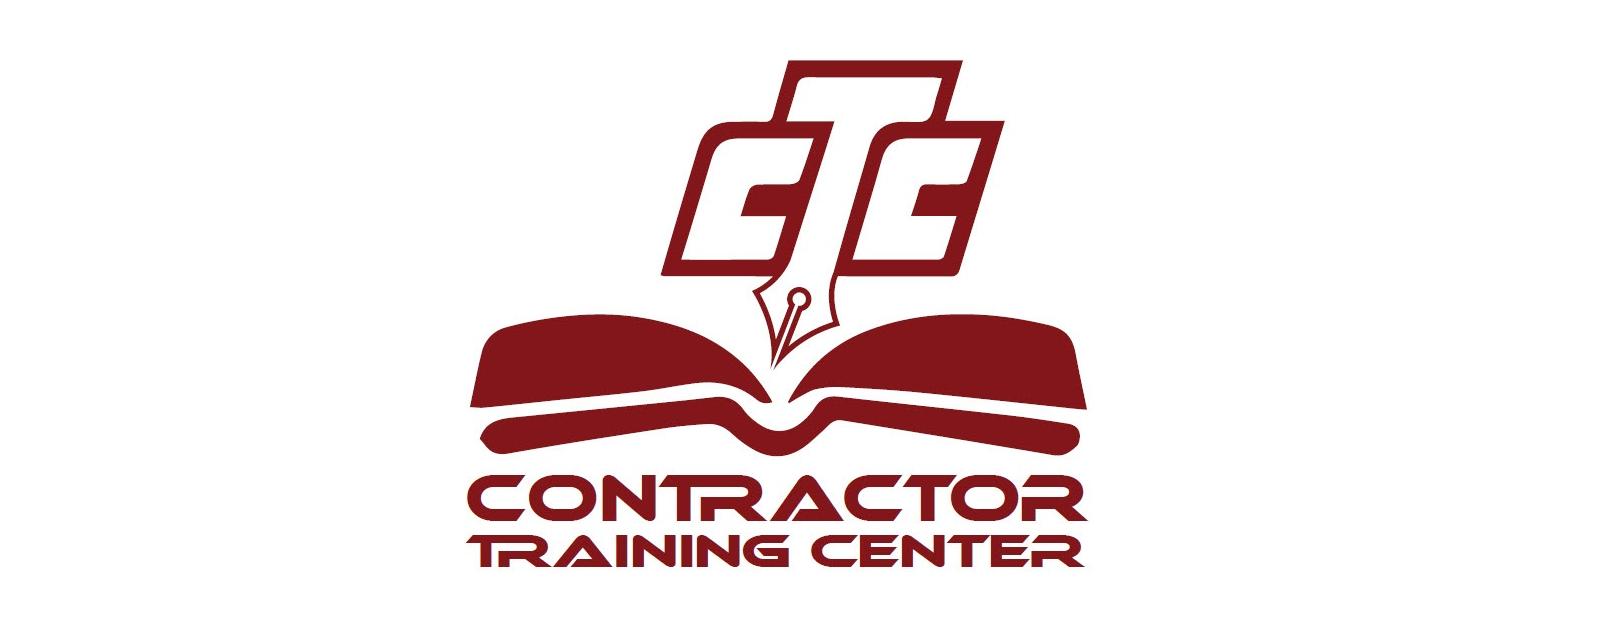 Contractor Training Center reviews | Educational Services at 1100 Welborne Dr - Richmond VA